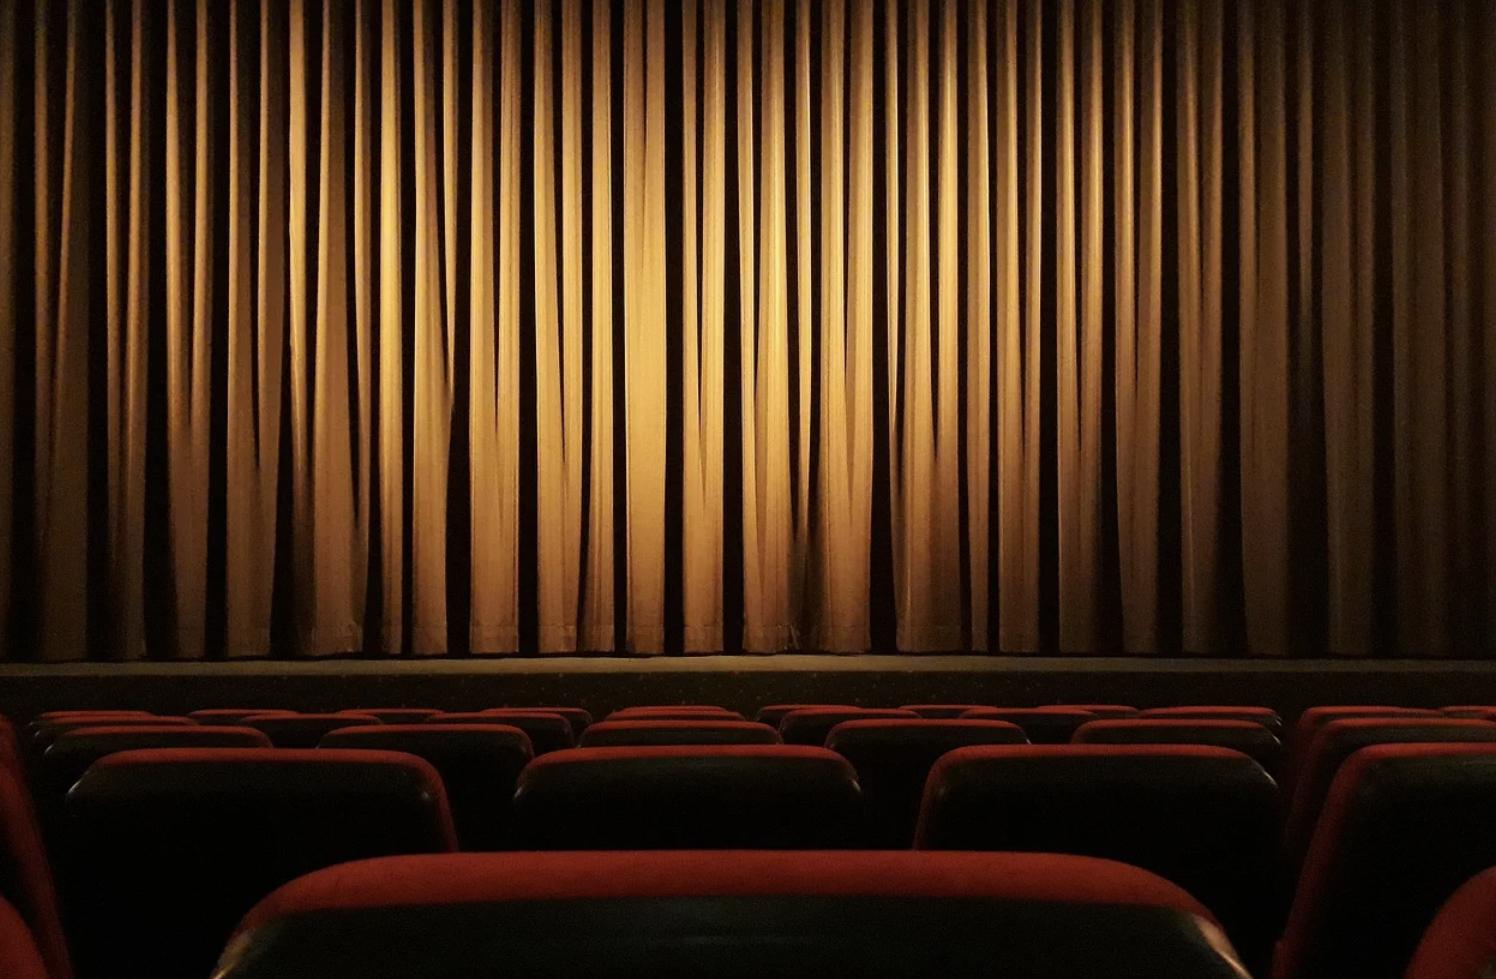 https://pixabay.com/photos/cinema-curtain-theater-film-4609877/